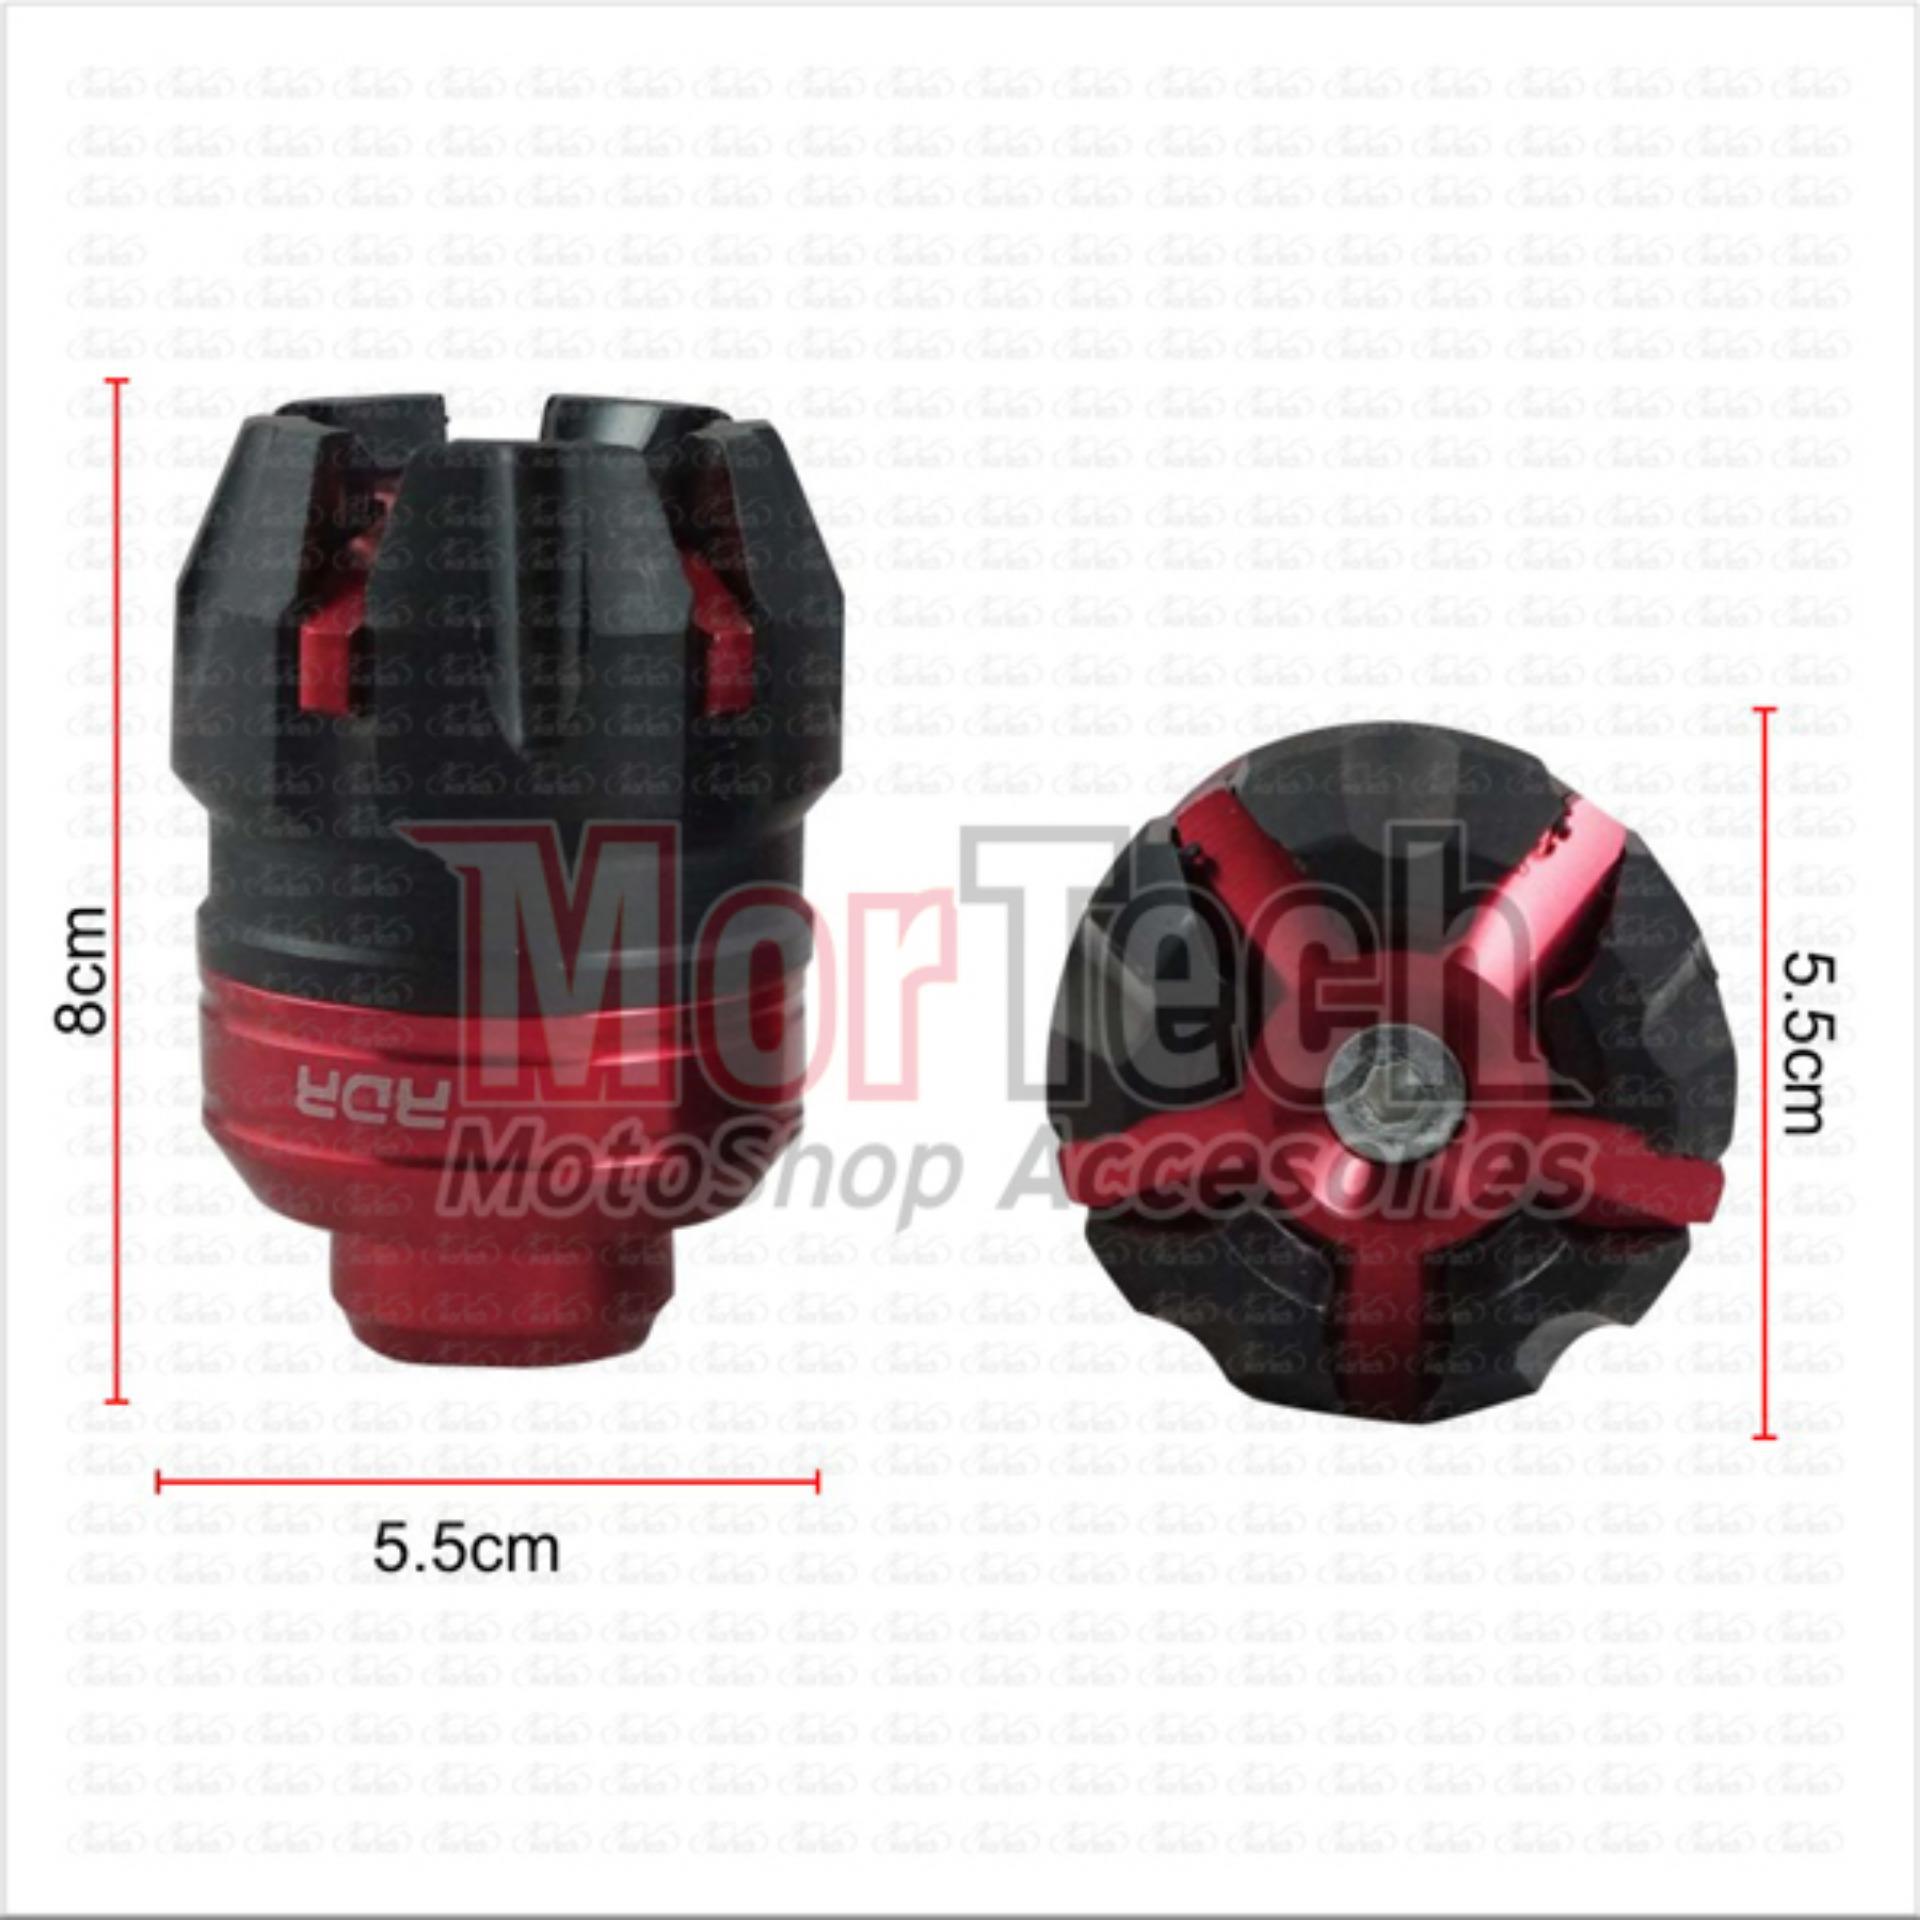 RDR Cover - Tutup - Jalu - Bandul as roda depan Mio J 1505 merah ...